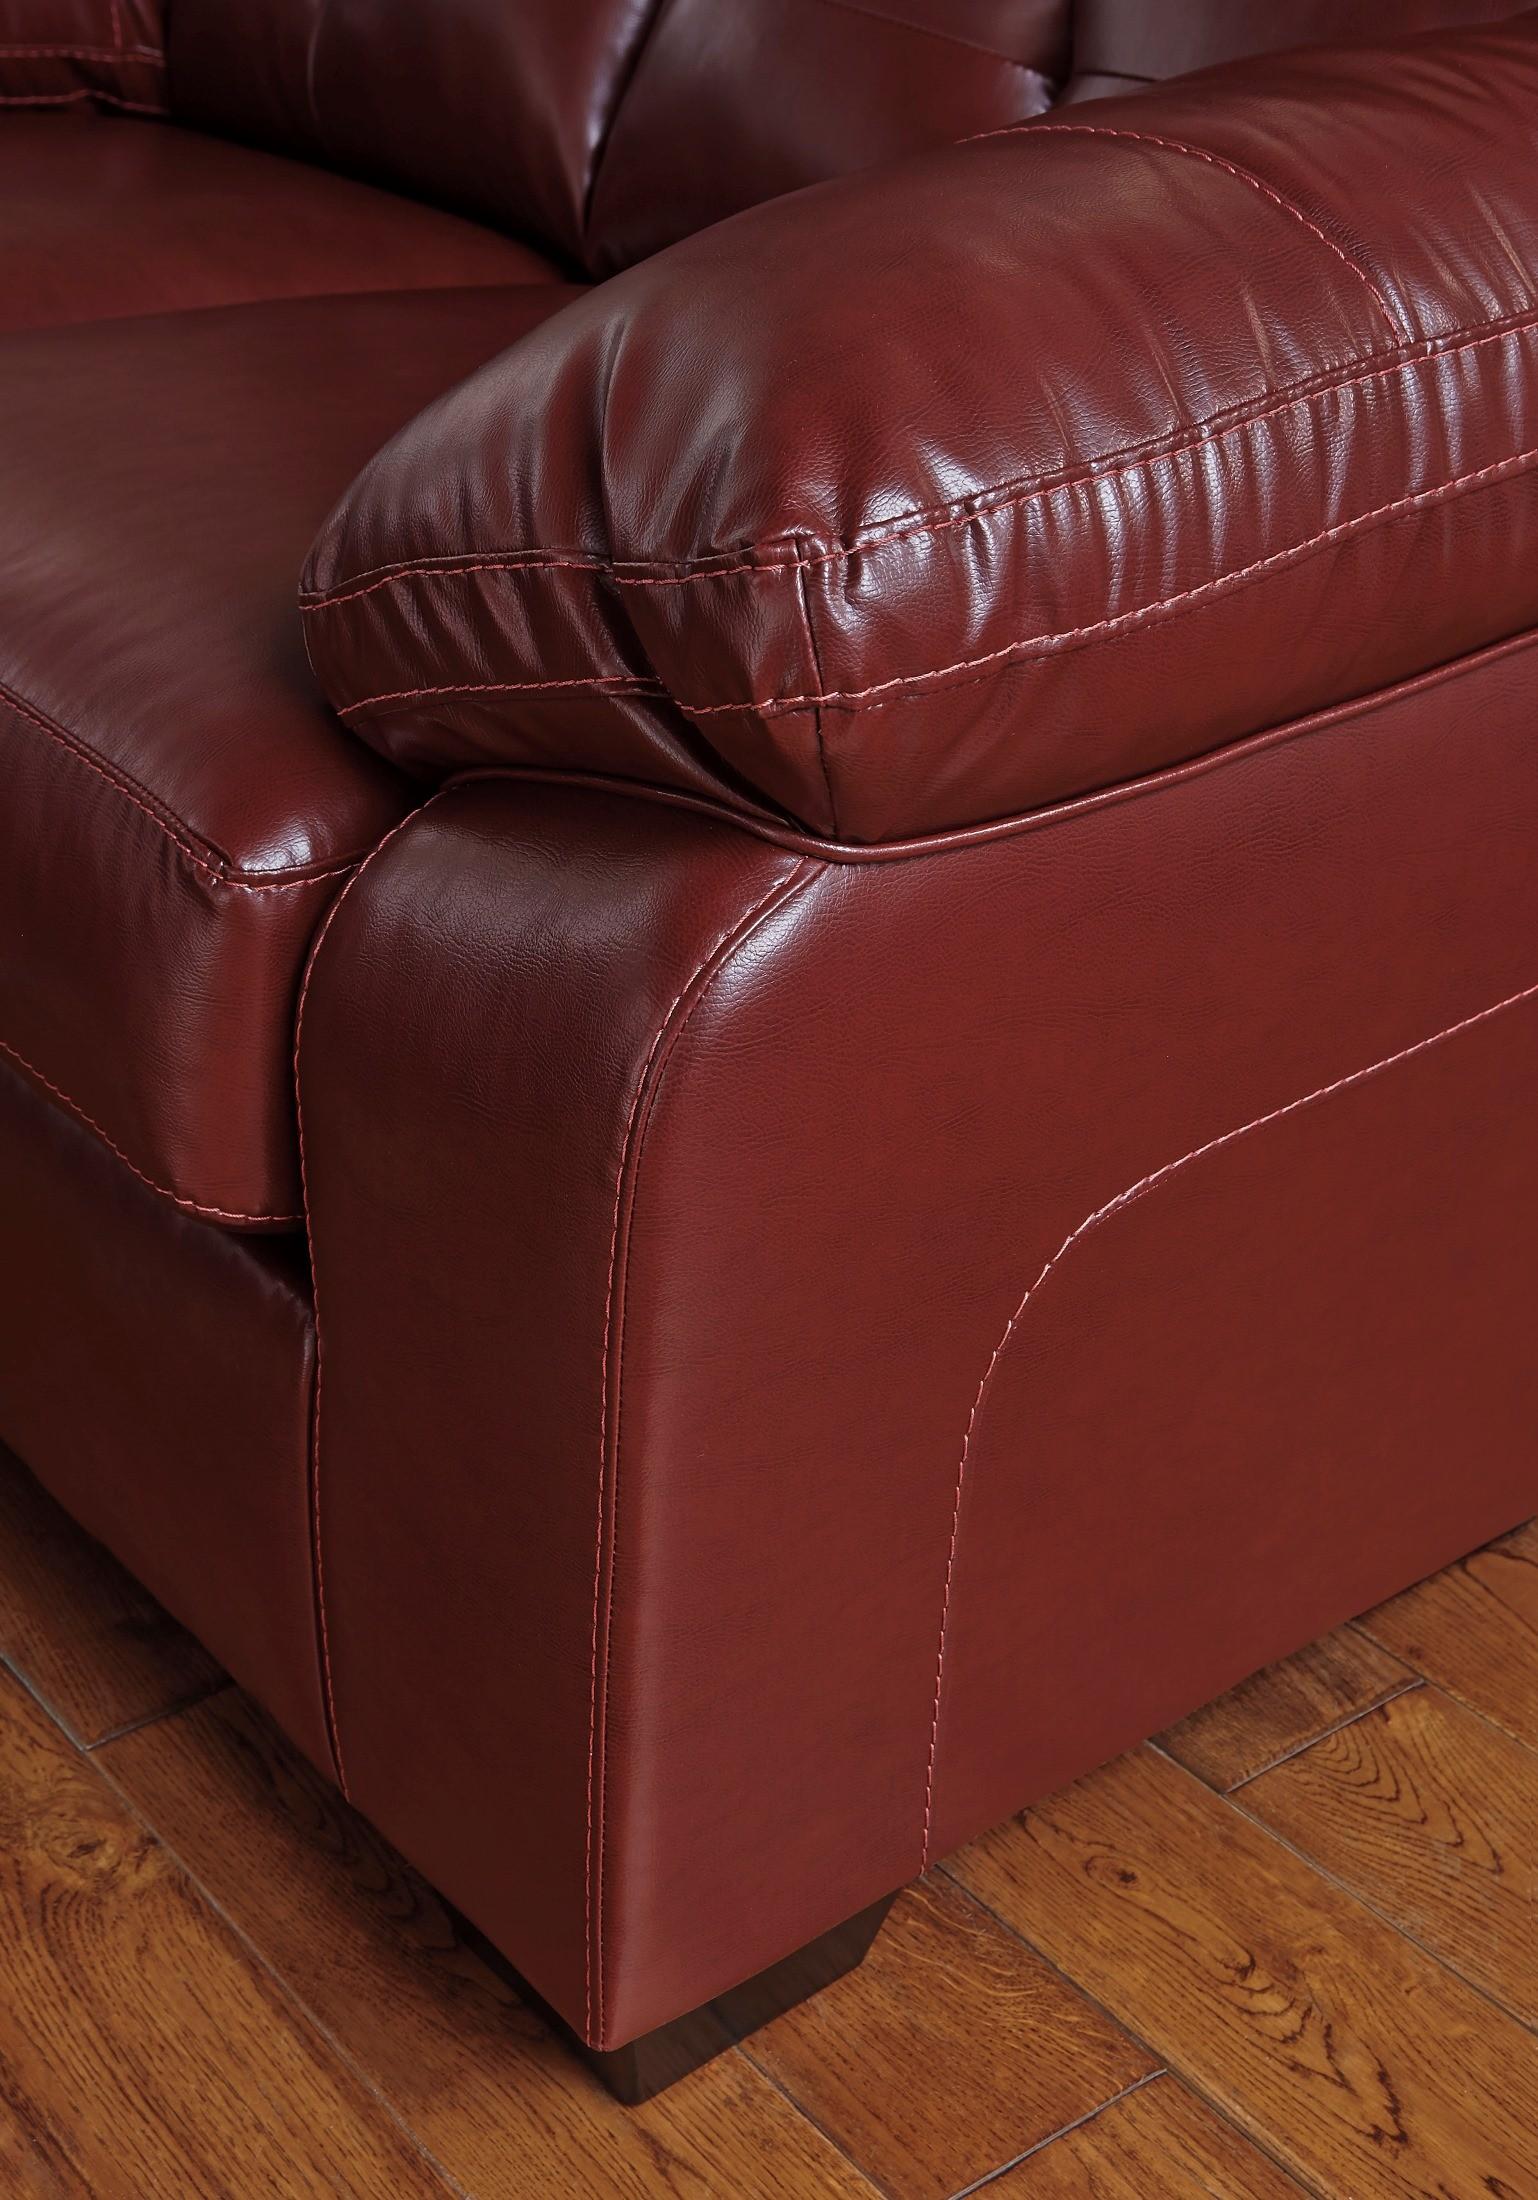 Ashley Furniture Porter Coffee Table ... Ashley Furniture Discontinued Pieces. on discontinued ashley furniture